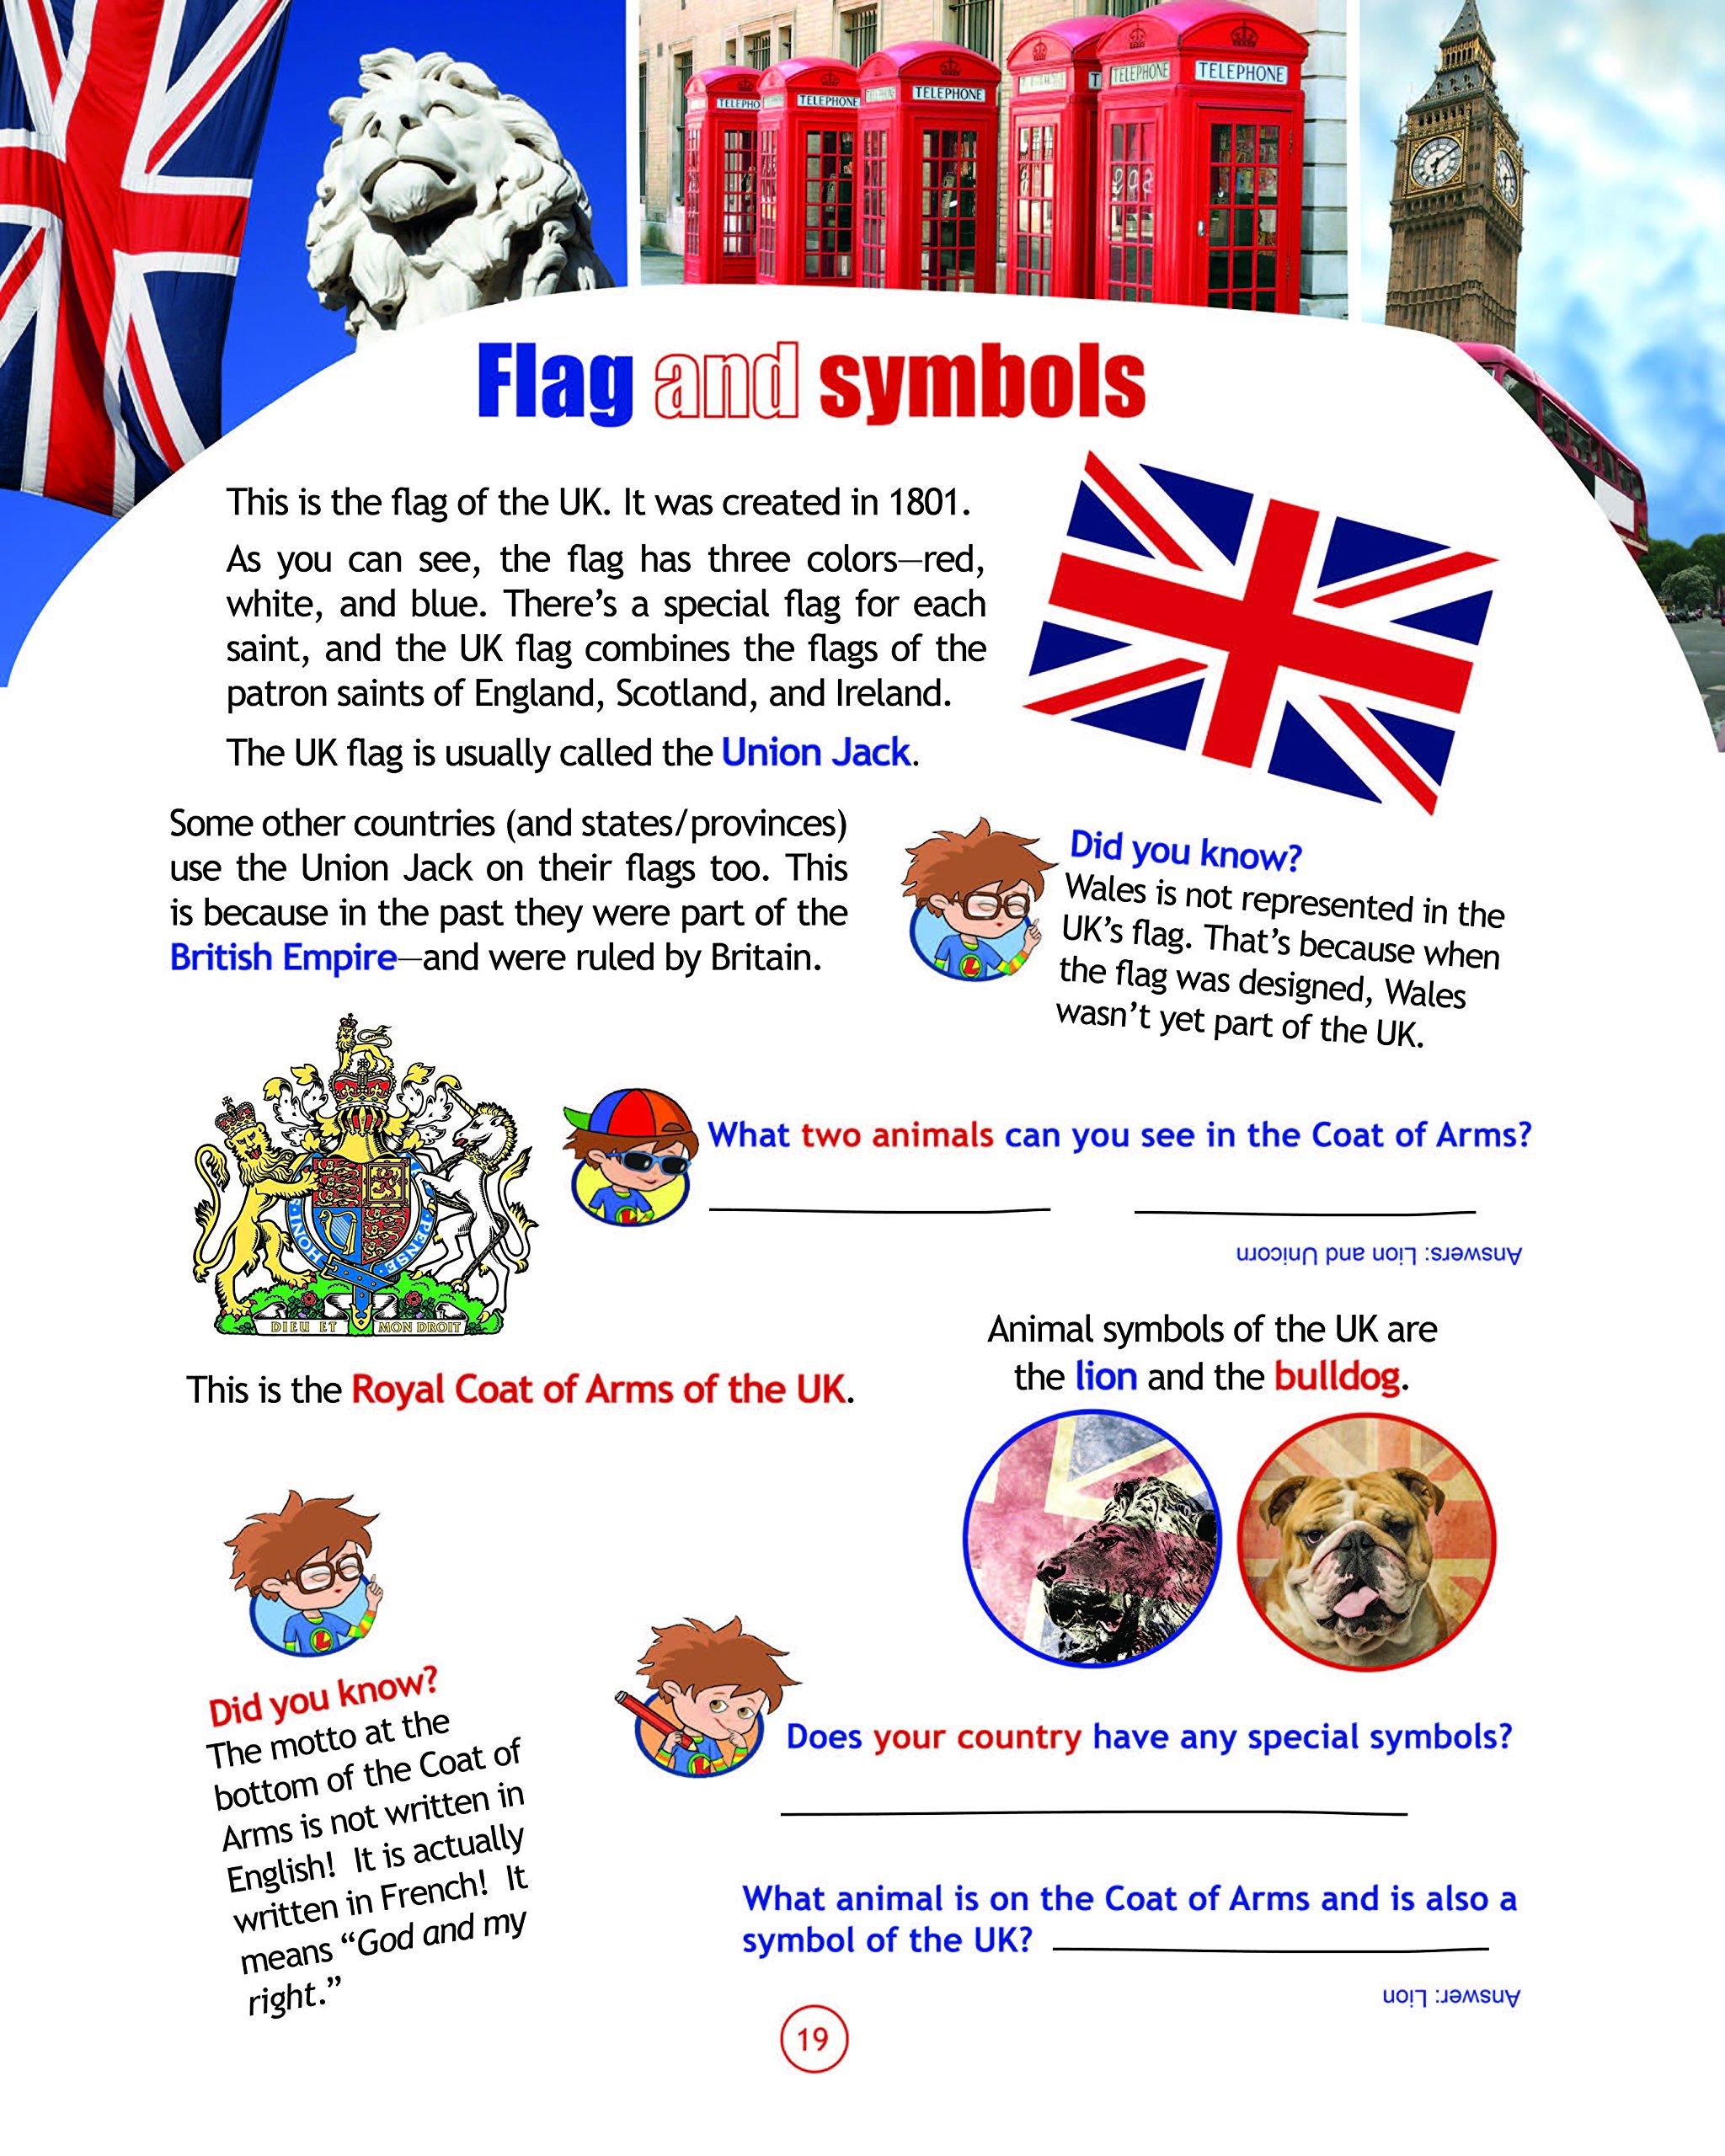 kids u0027 travel guide uk u0026 london the fun way to discover the uk